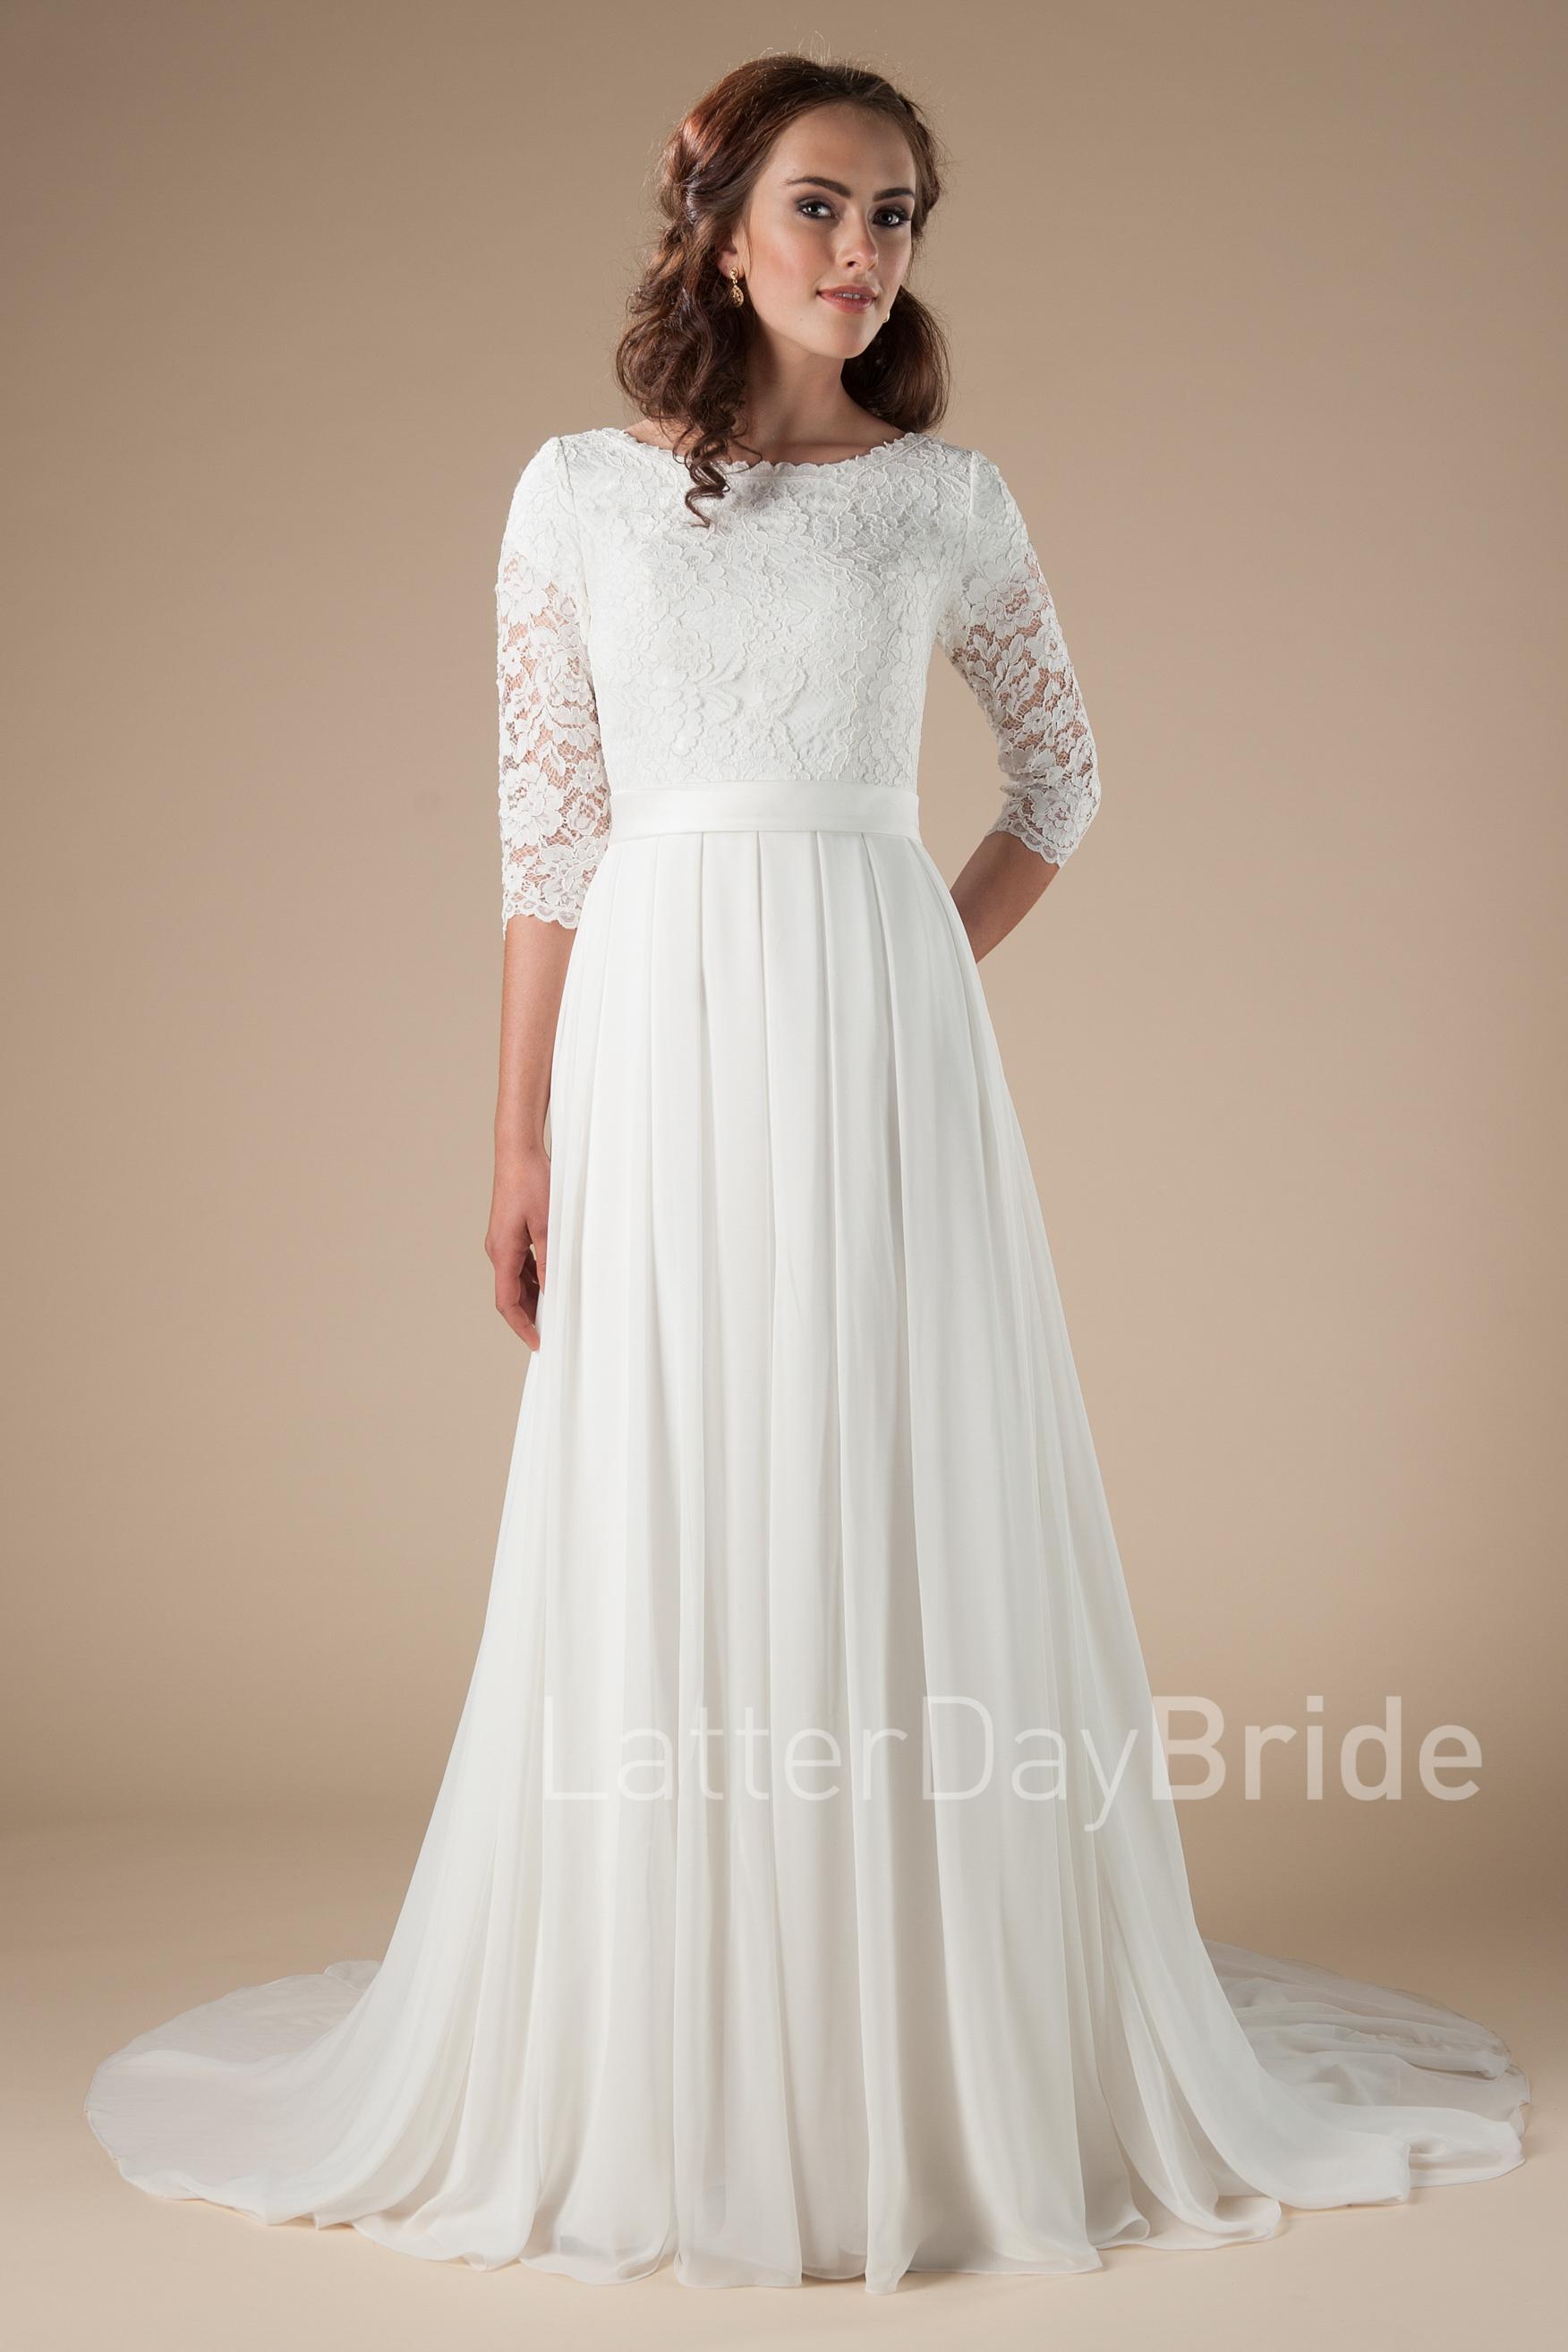 modest long sleeved wedding dresses photo - 1